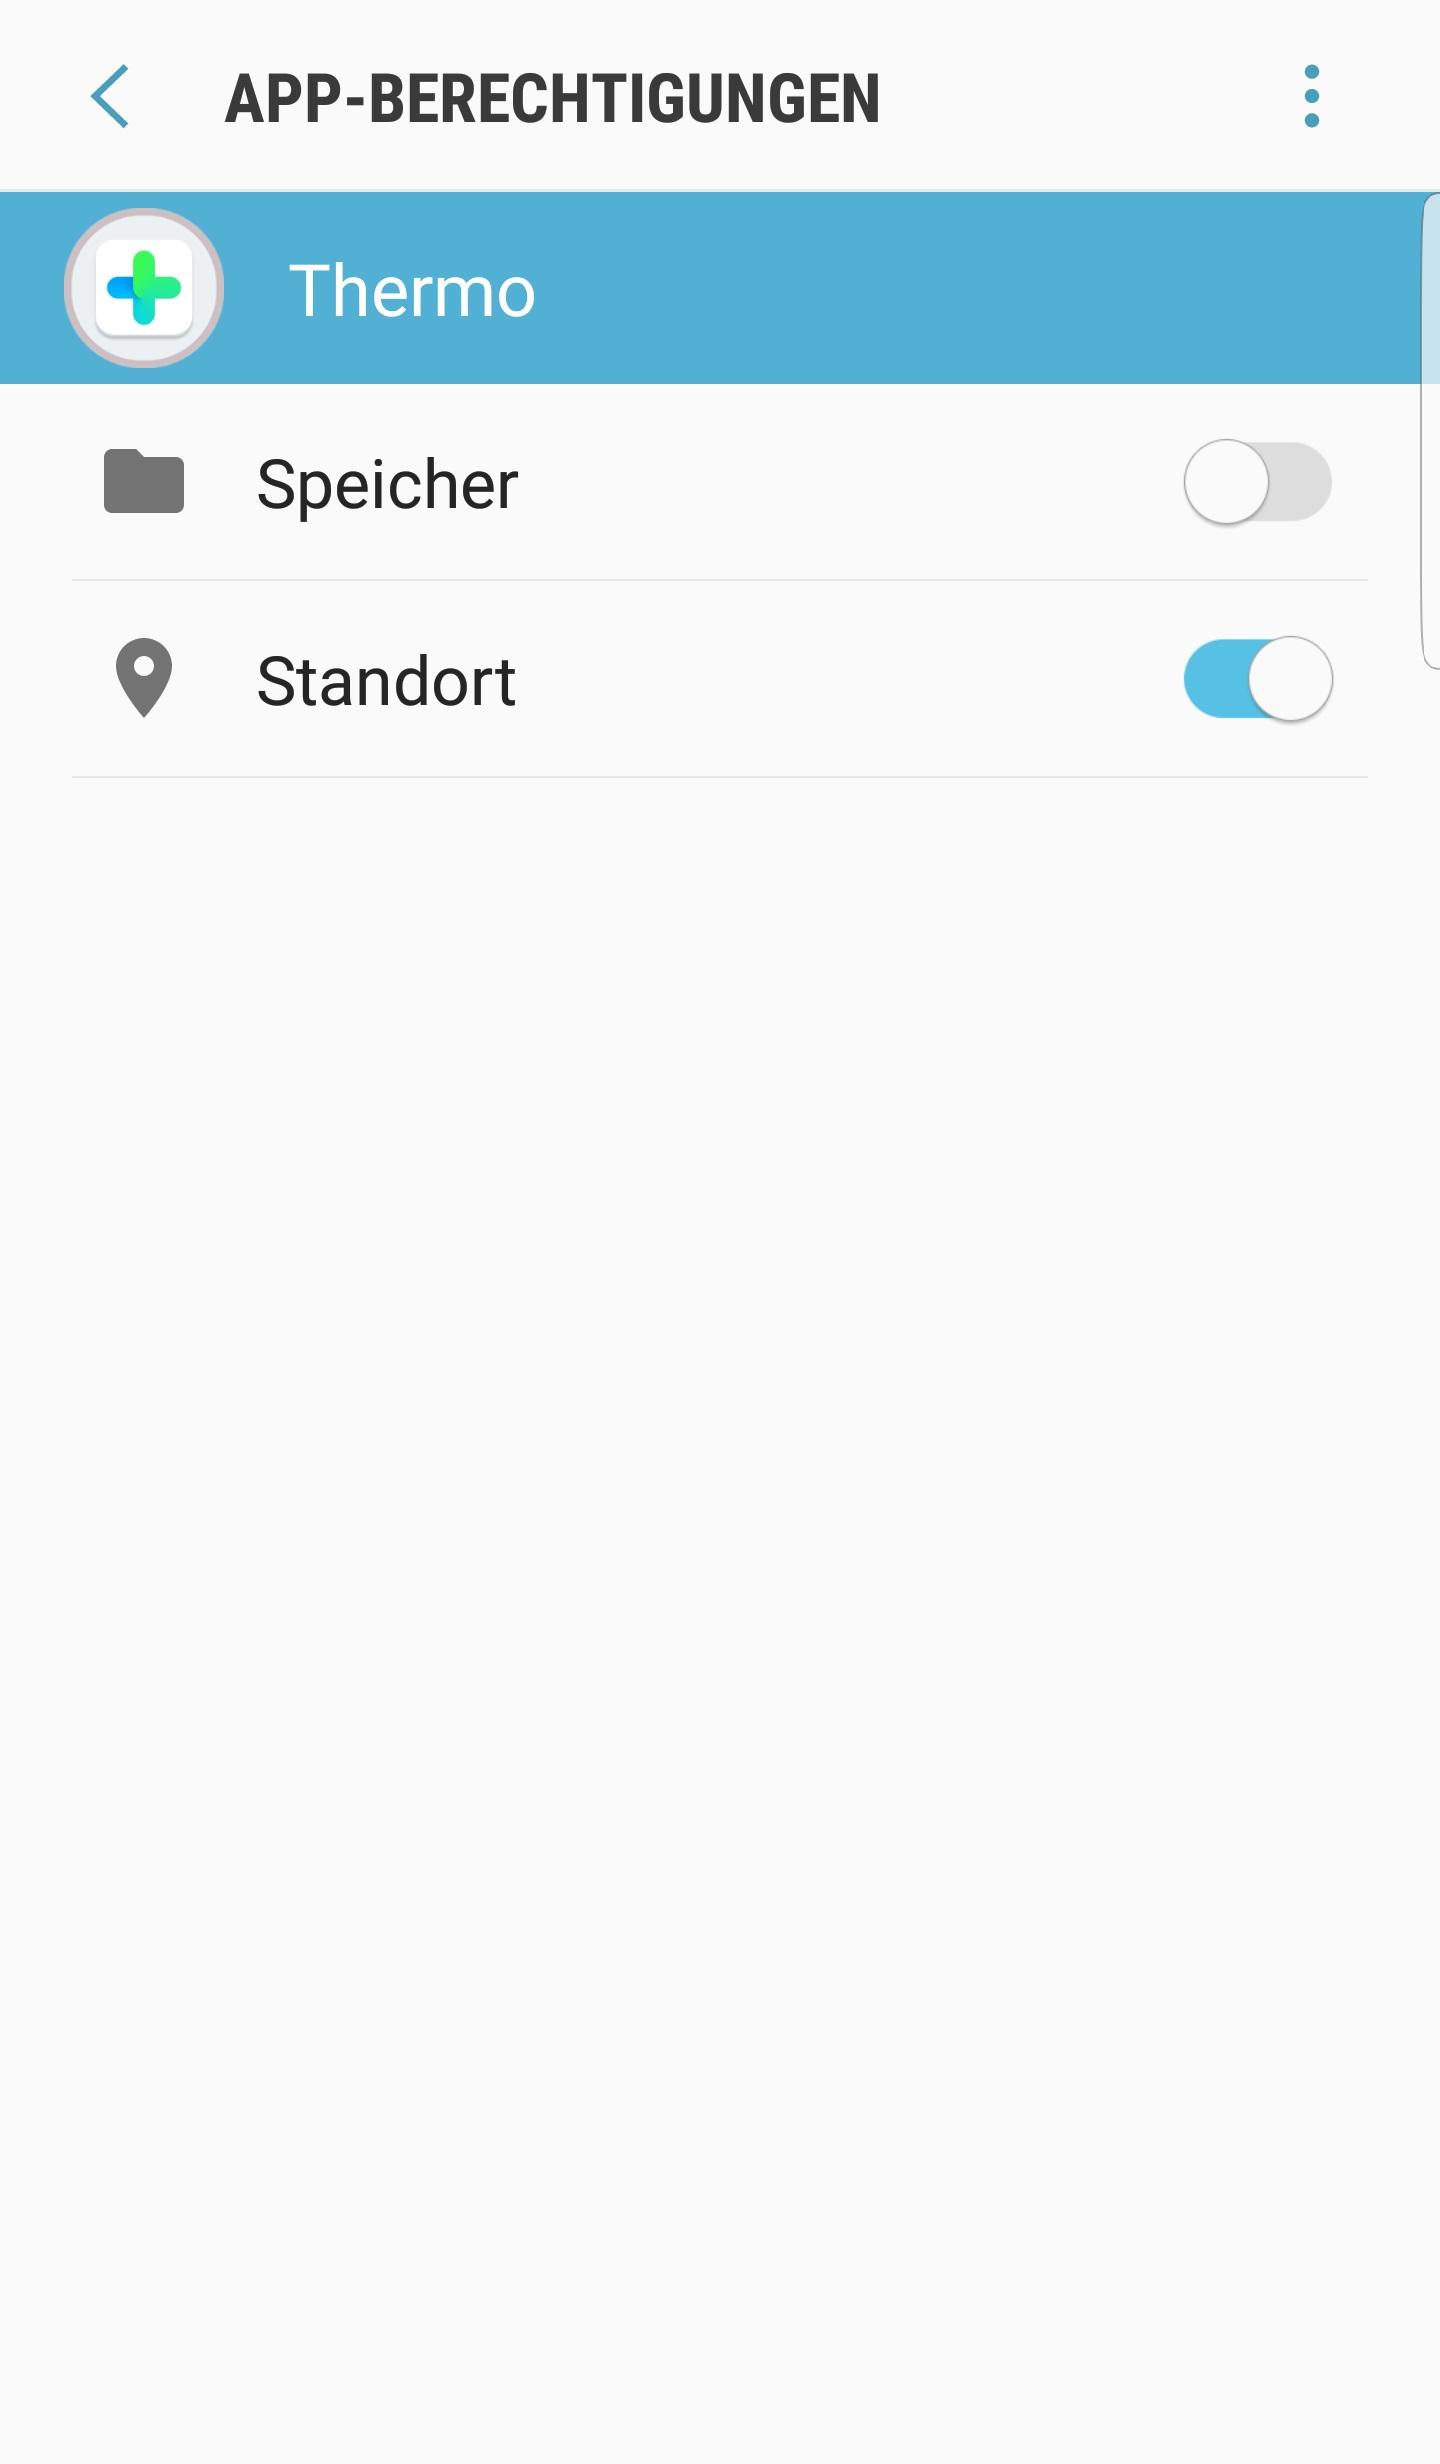 Thermo_app_permission_de.jpg